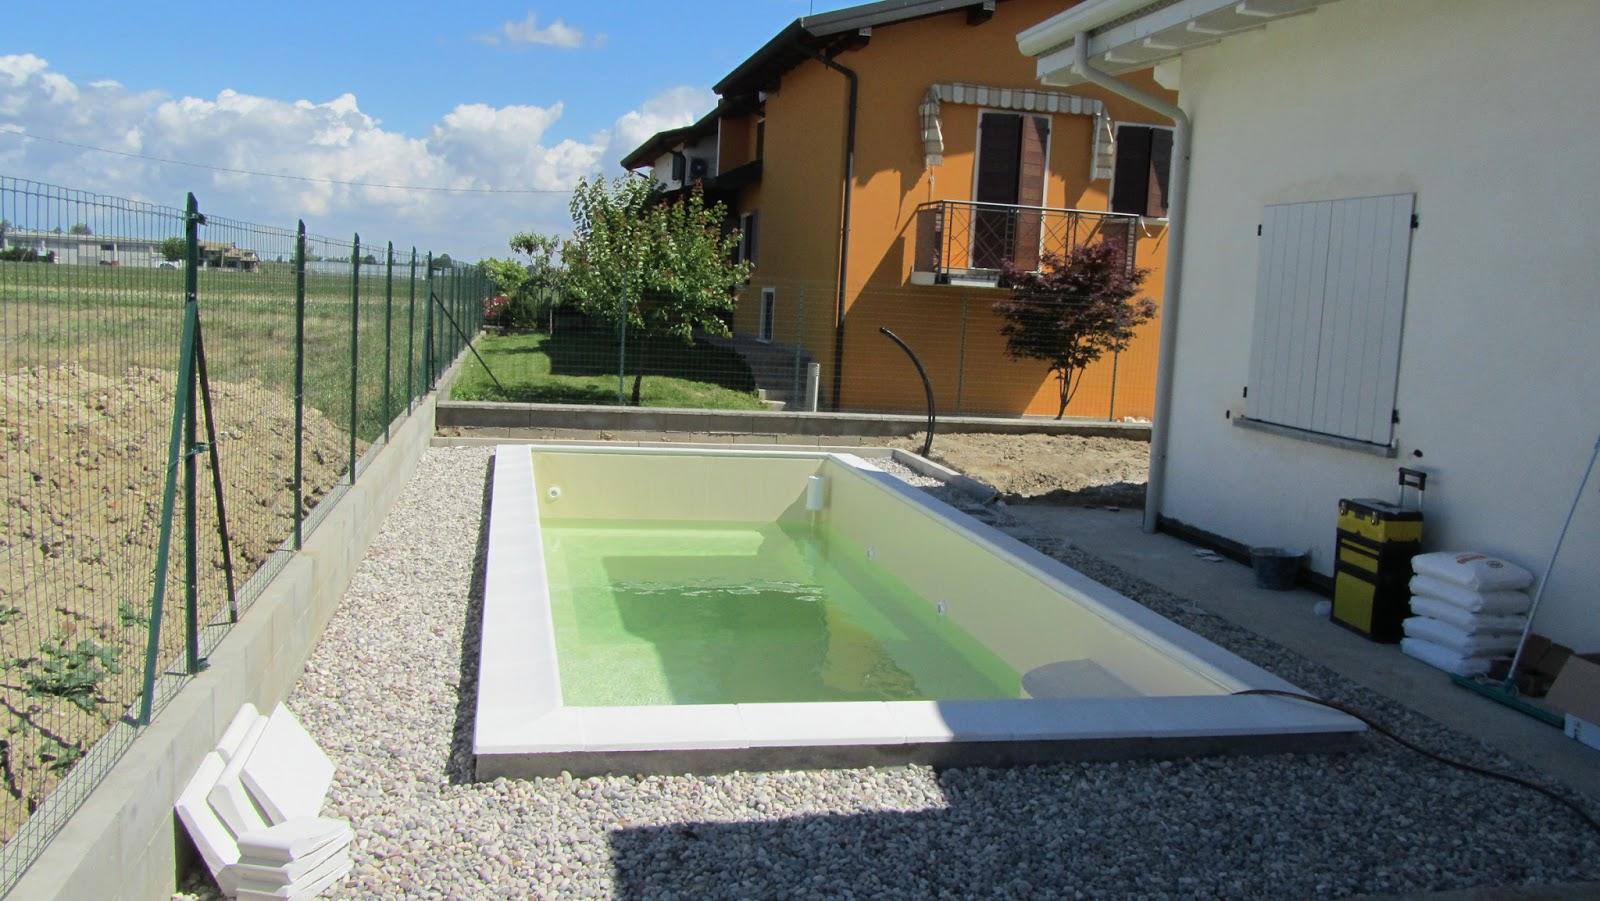 Piscine laghetto news blog speciale cantieri piscine opera - Piscine laghetto ...